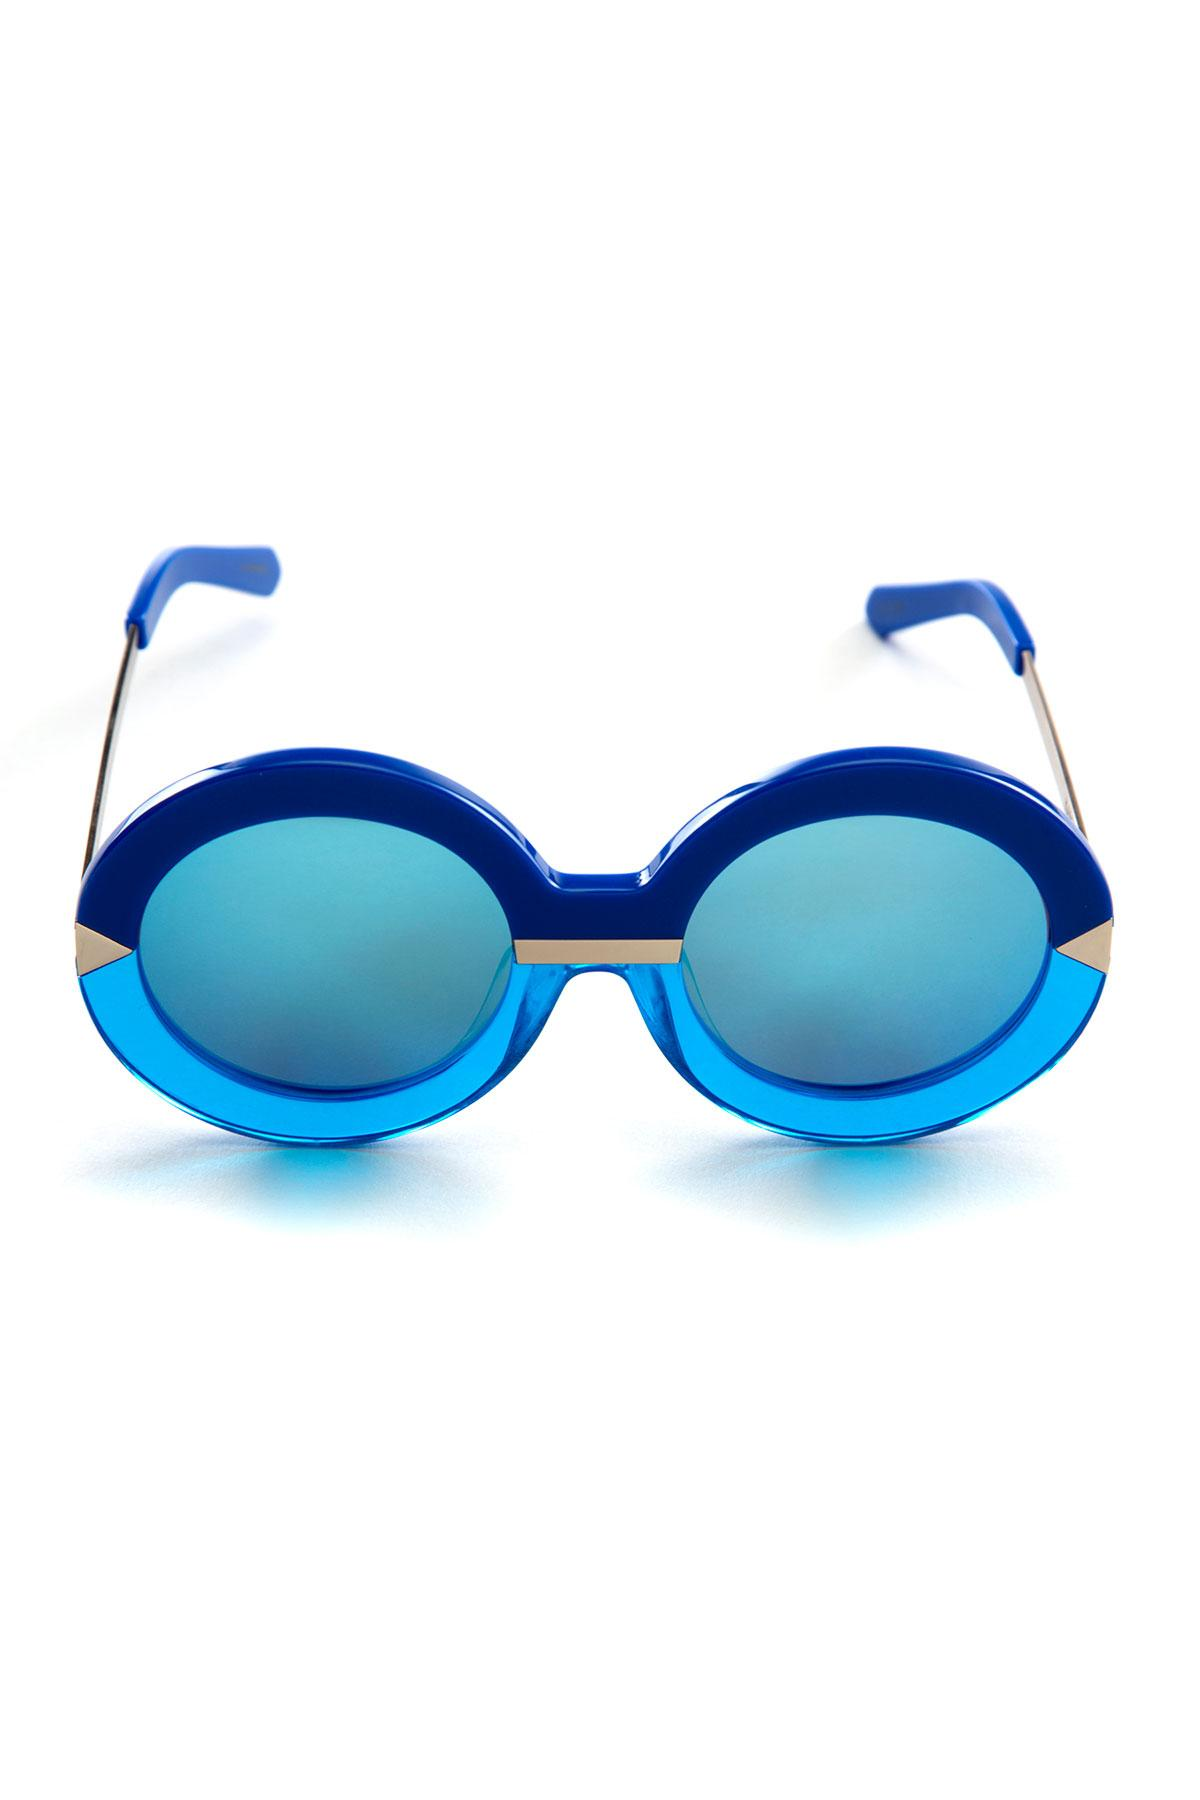 54e011273d Karen Walker sunglasses Hollywood Pool Sea Blue AND Crystal Aqua sunglasses  for rent